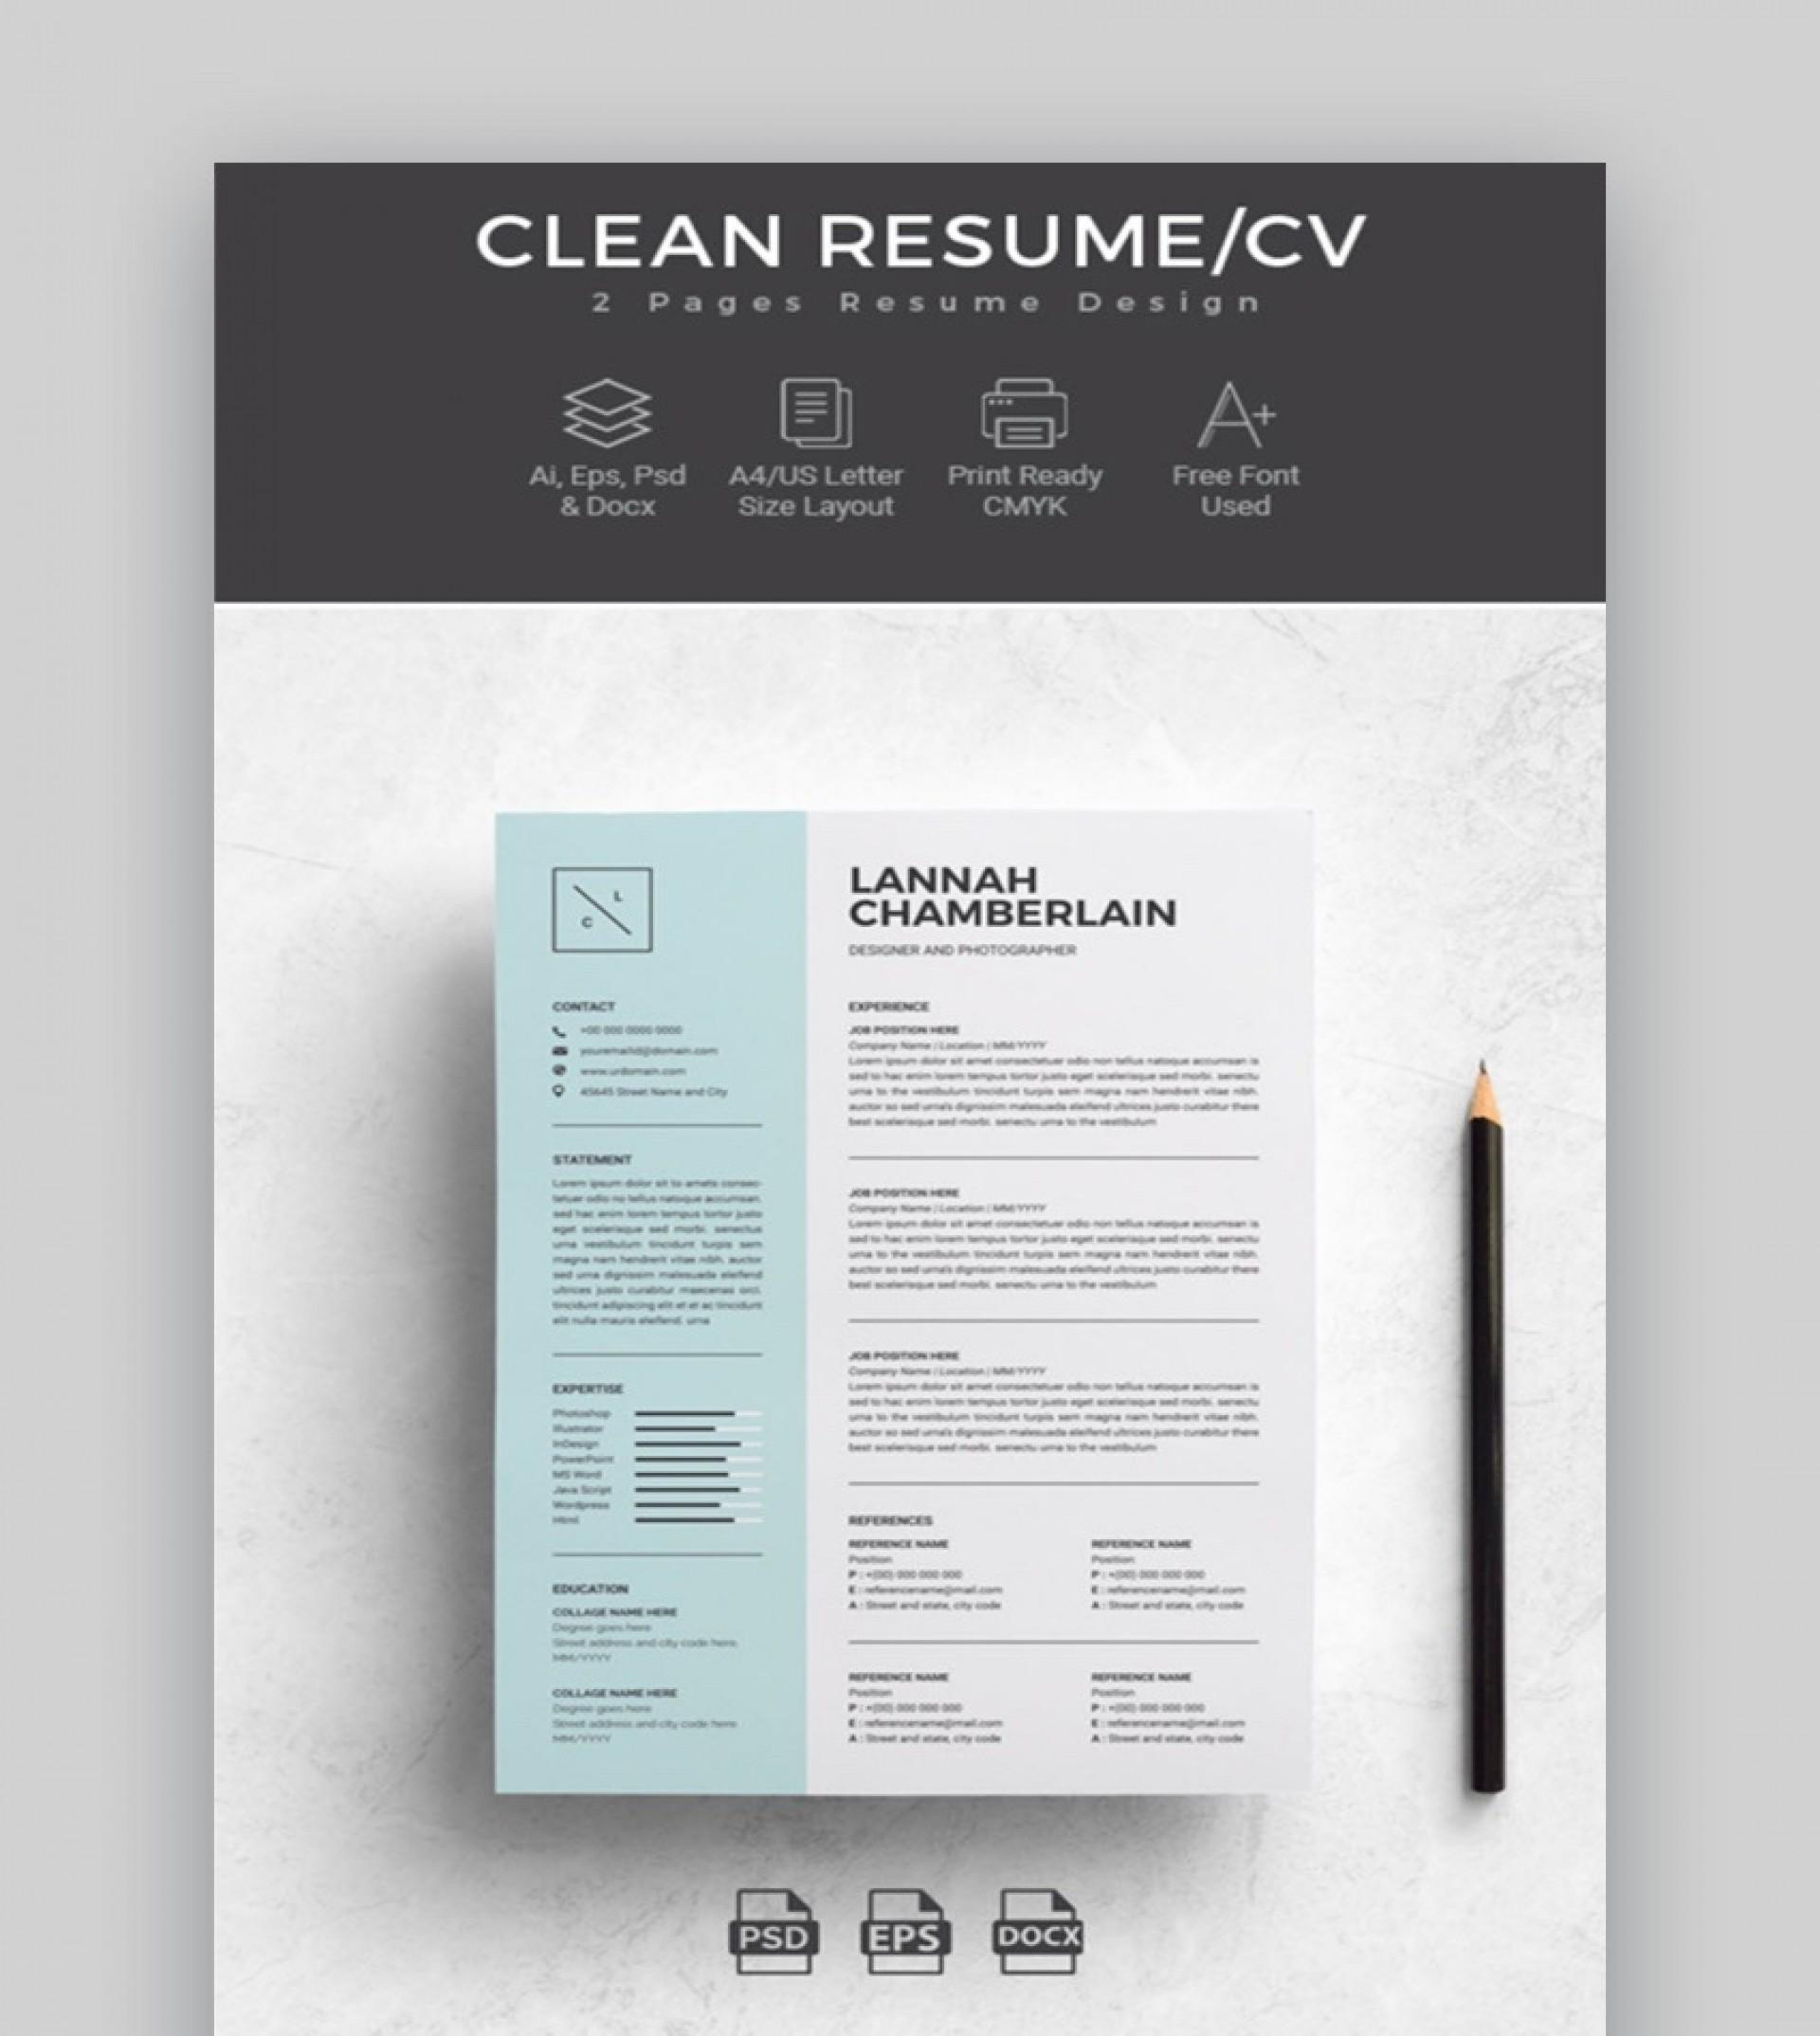 003 Amazing Word Resume Template Mac High Def  2011 Free Microsoft1920